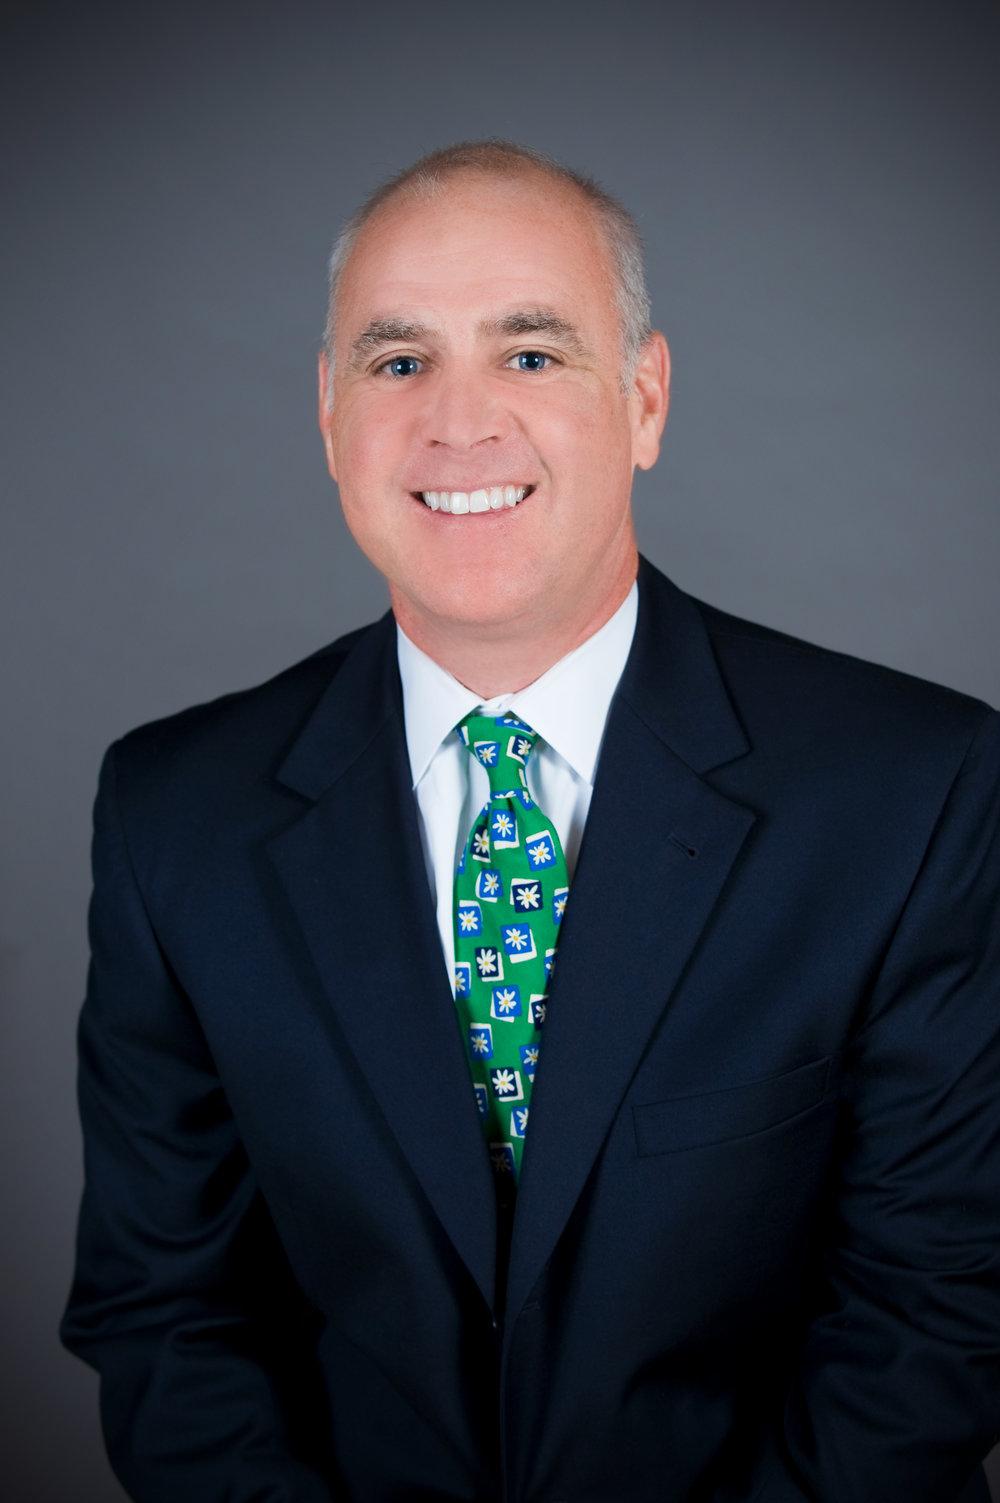 Donald R. Jones, Elder Law and Estate Planning Attorney